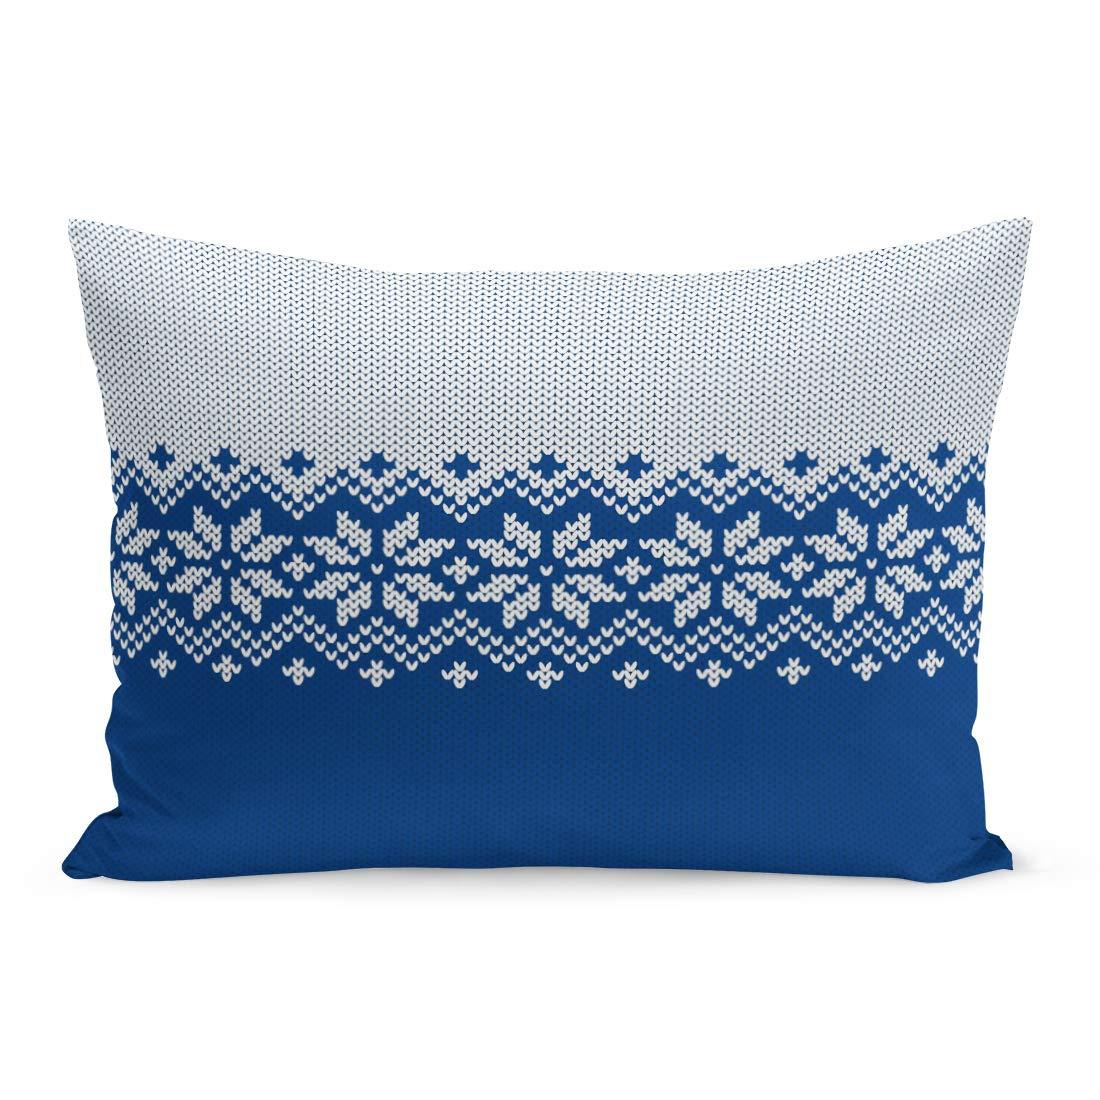 Knitting Machine Brother Jacquard Patterns | 1000 Free ...